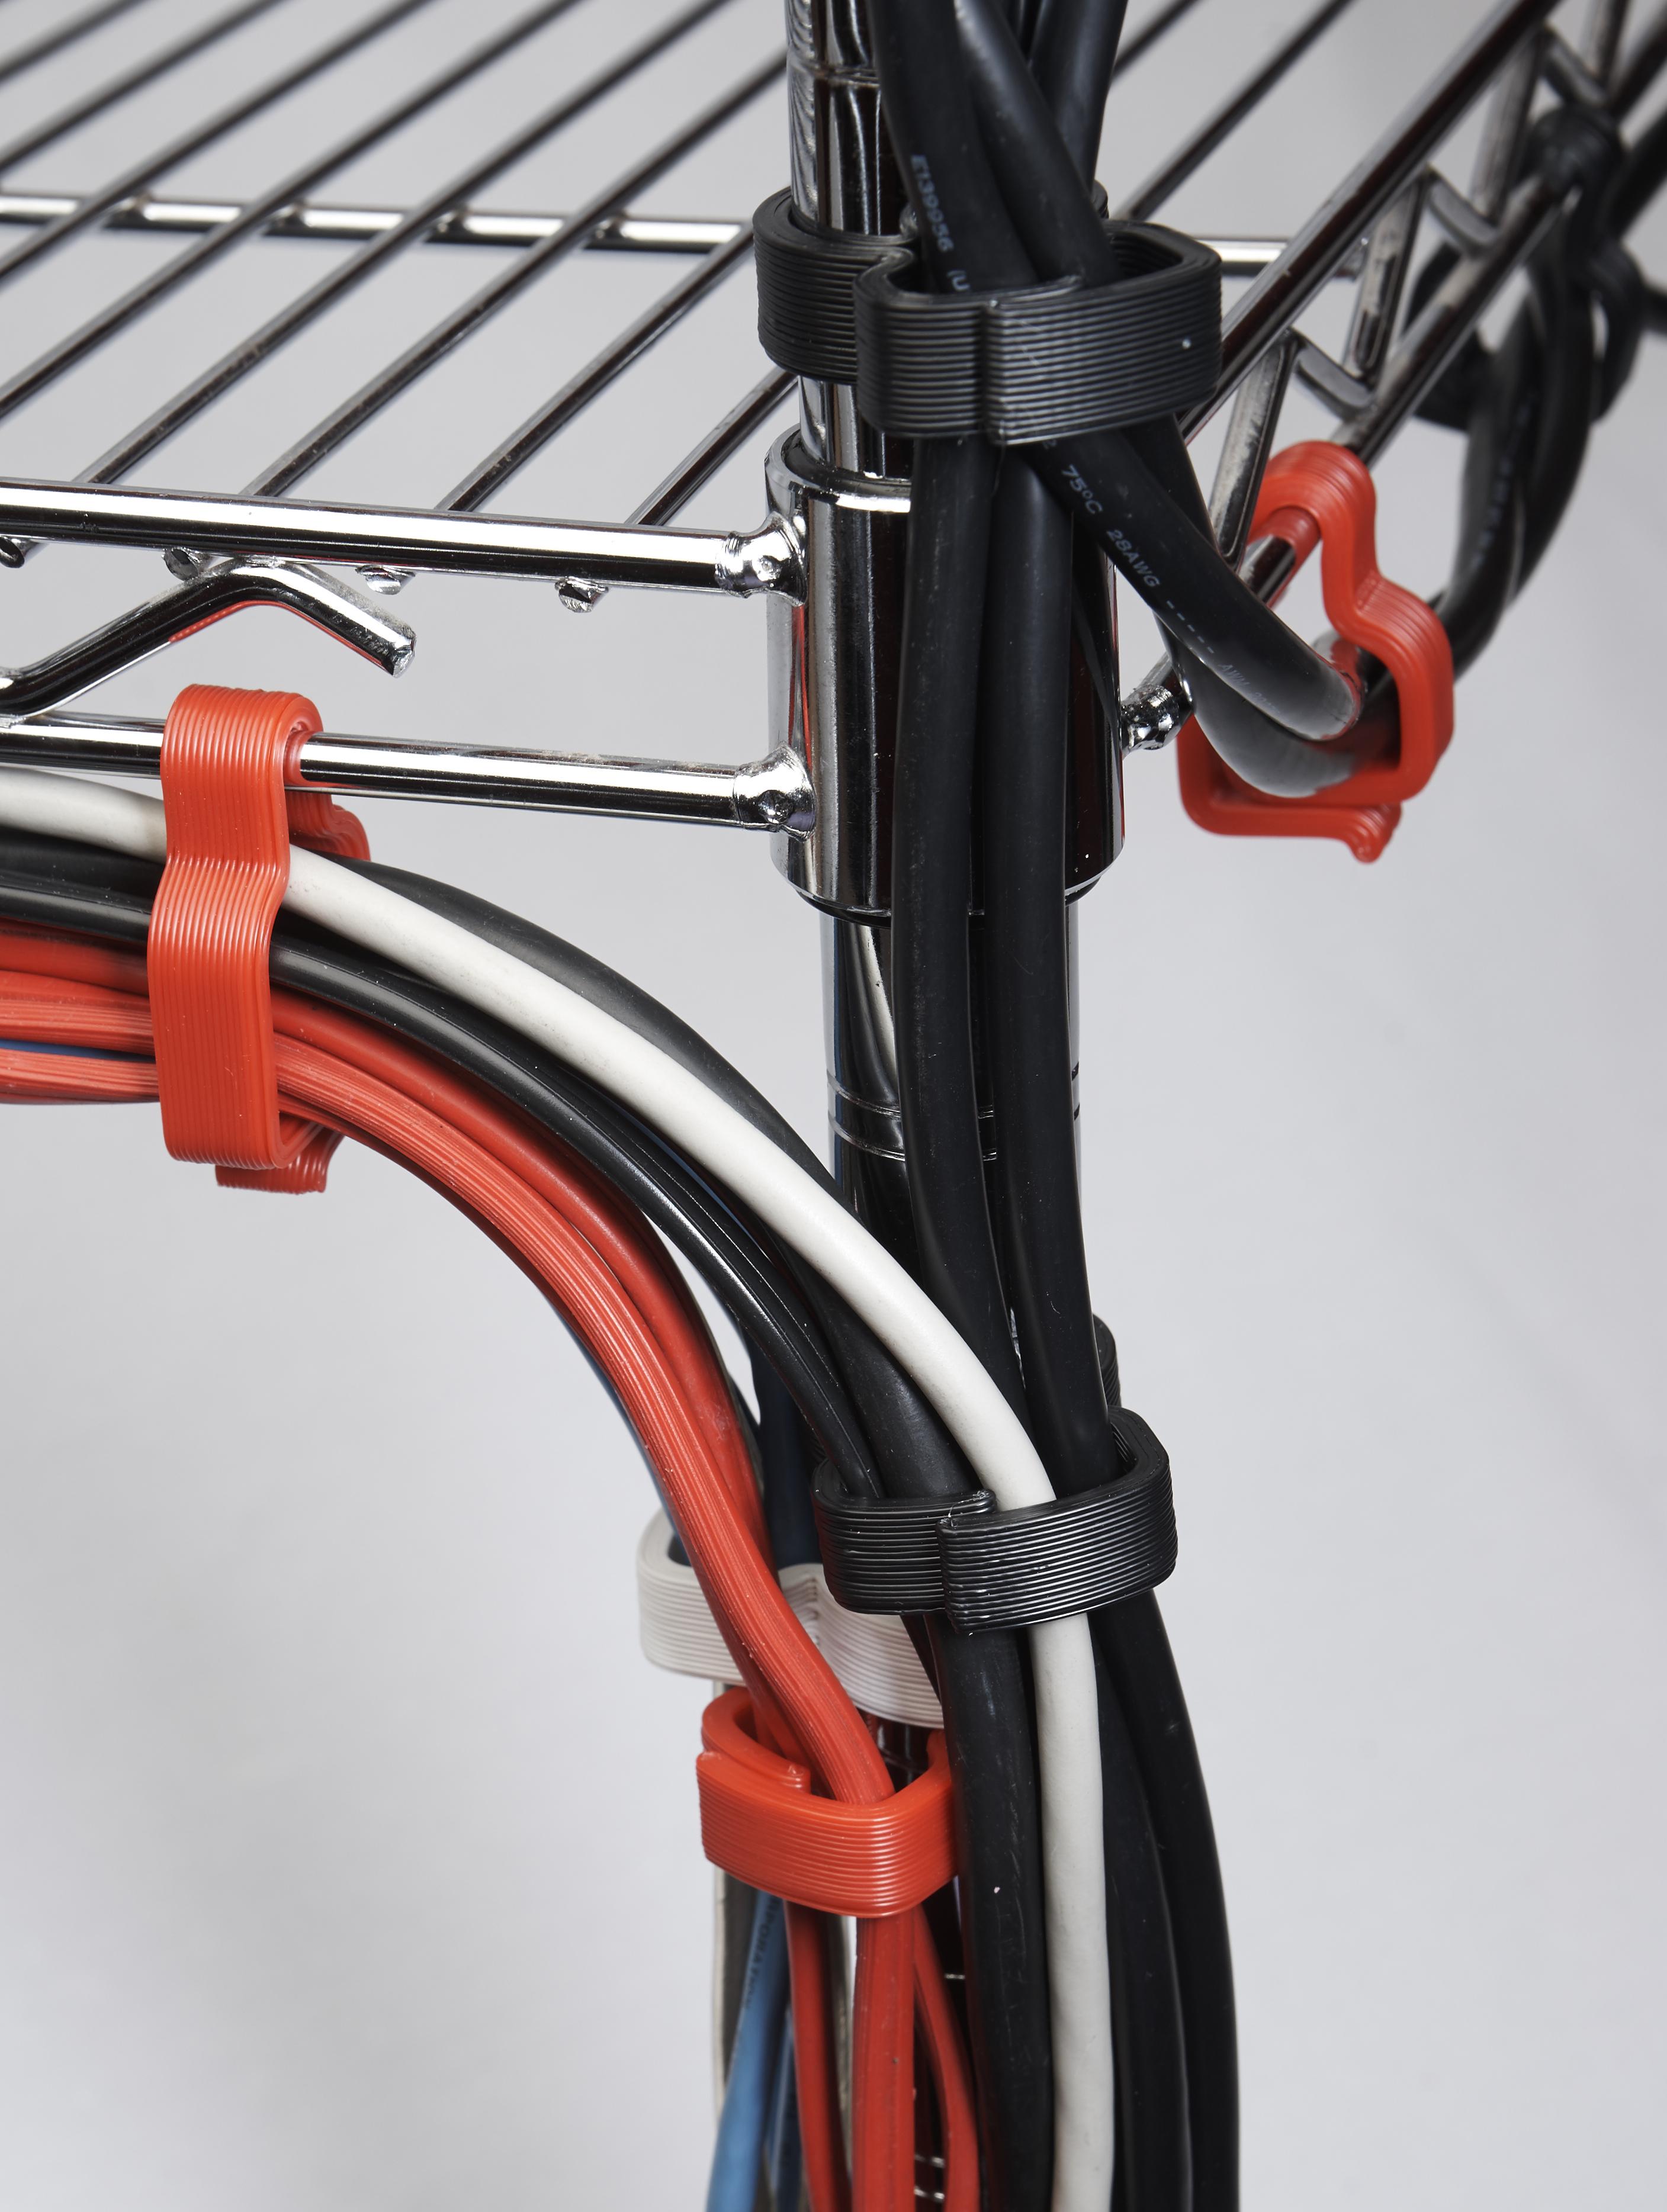 4CELNK-YR for Wire Shelving Racks – 4CELNK.com